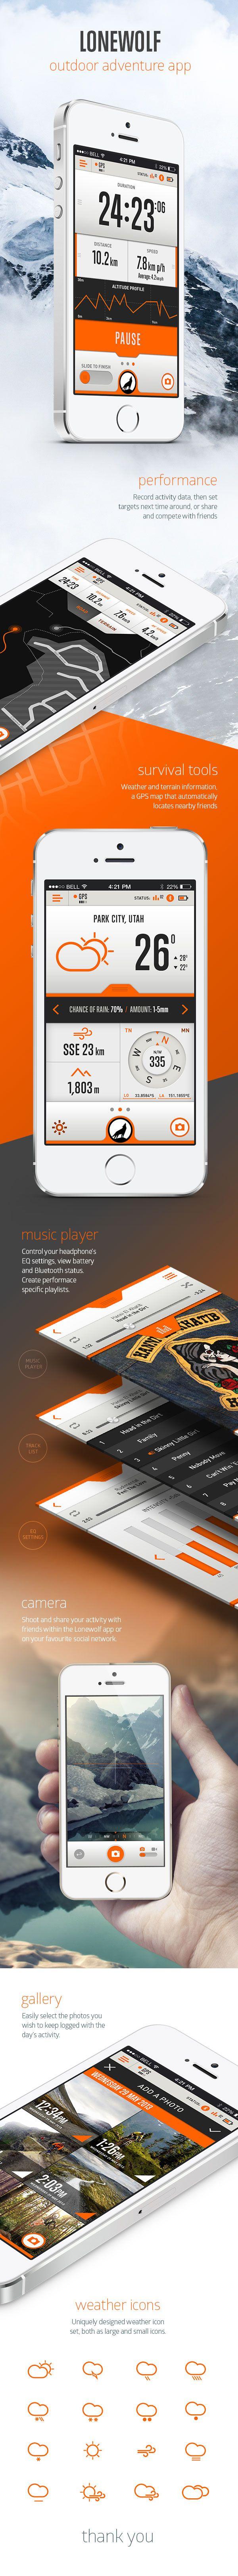 Lonewolf by Stephen Busuttil, via Behance #app #mobile #sport #outdoor #design #ui #ux